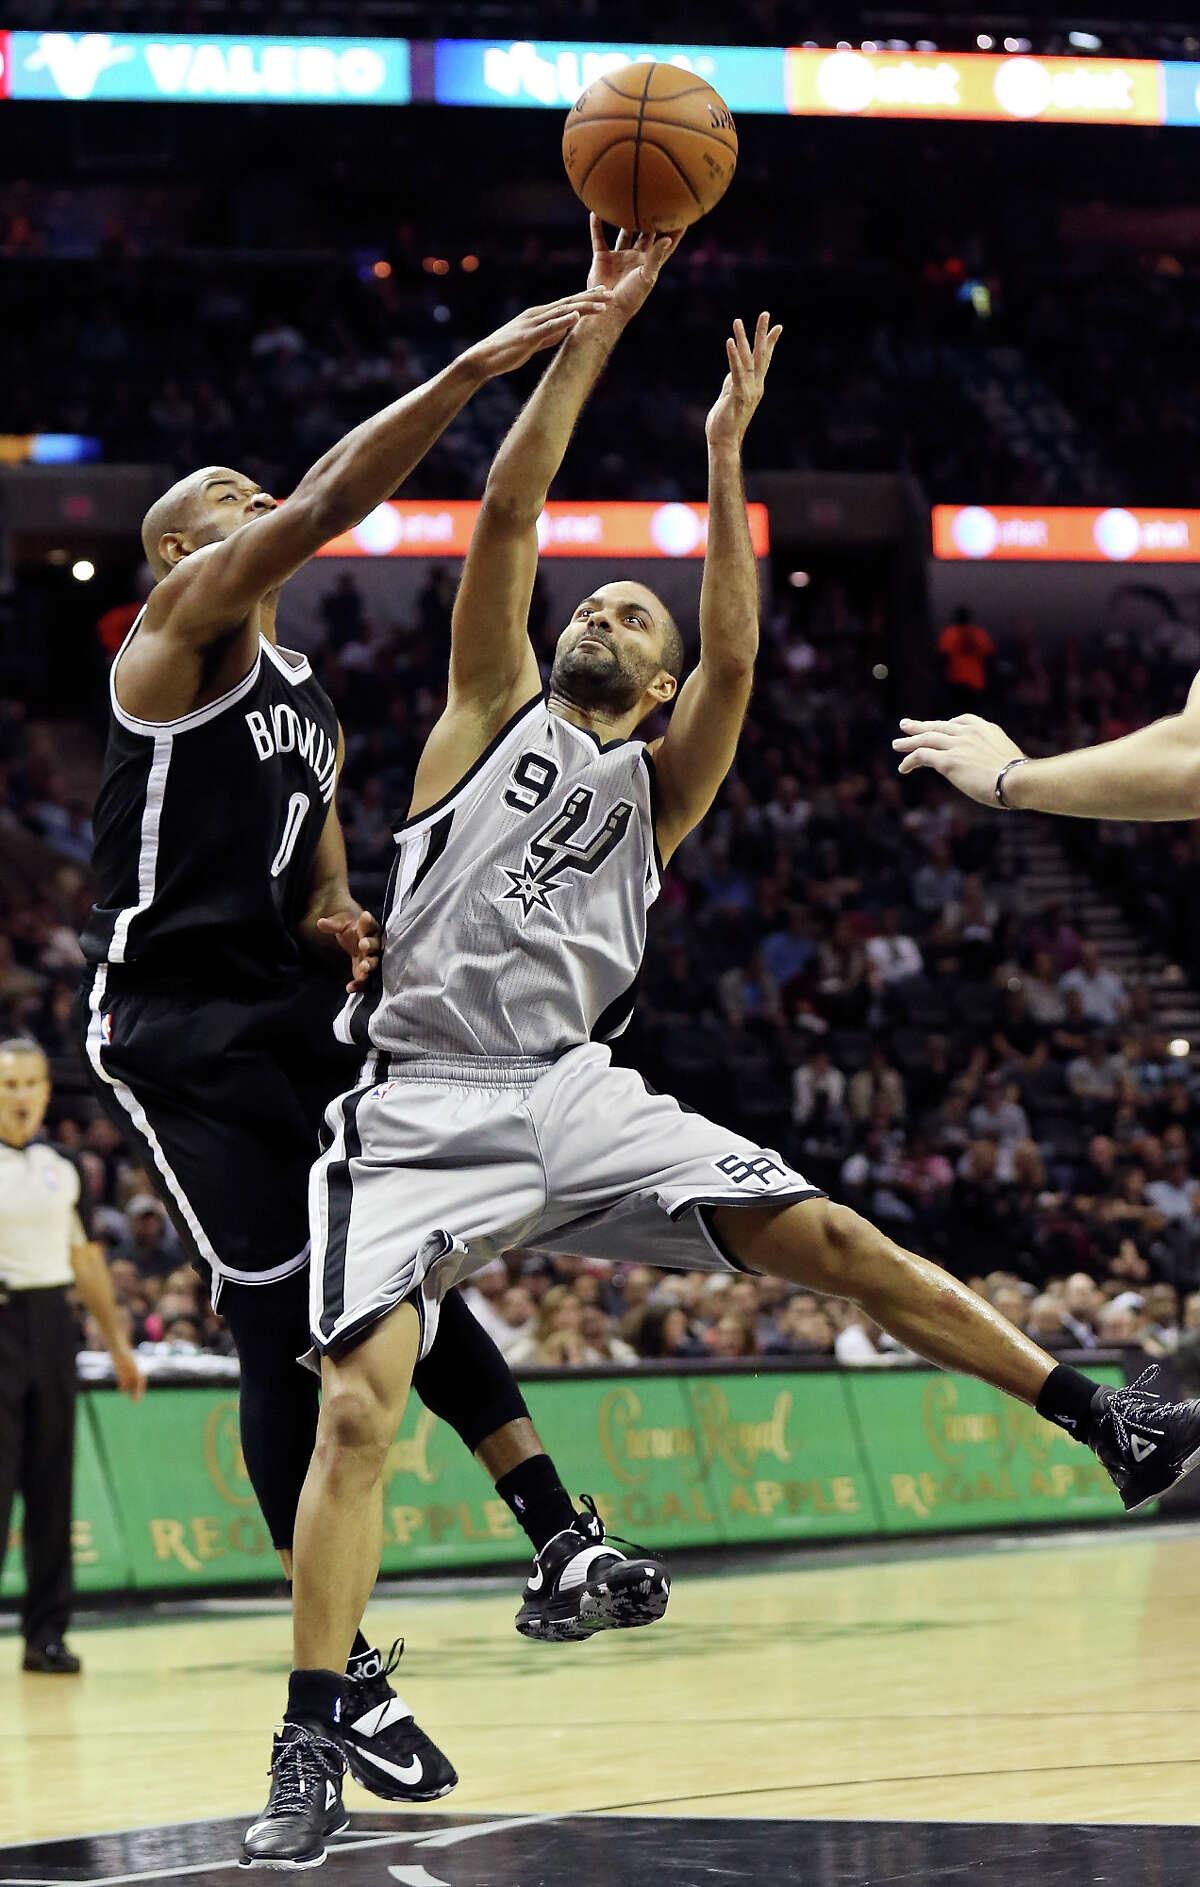 San Antonio Spurs' Tony Parker shoots against Brooklyn Nets' Jarrett Jack during first half action Saturday Nov. 22, 2014 at the AT&T Center.